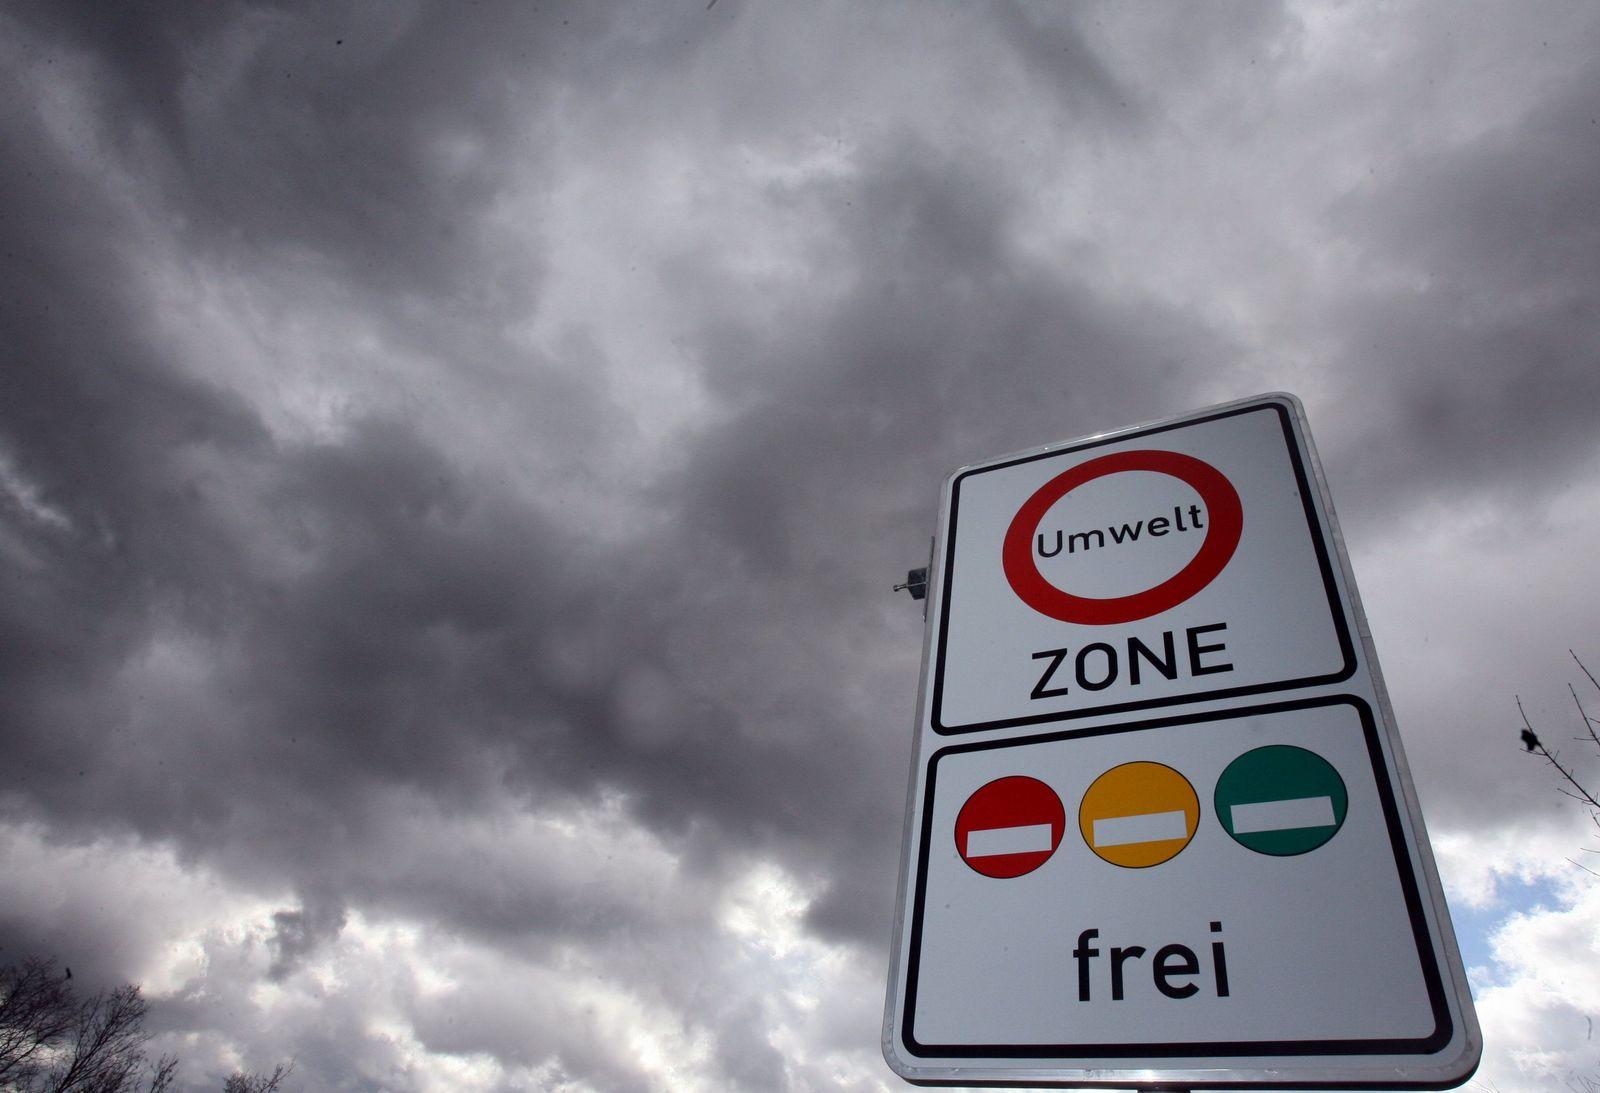 Feinstaubwerte 2011 / Umweltzone